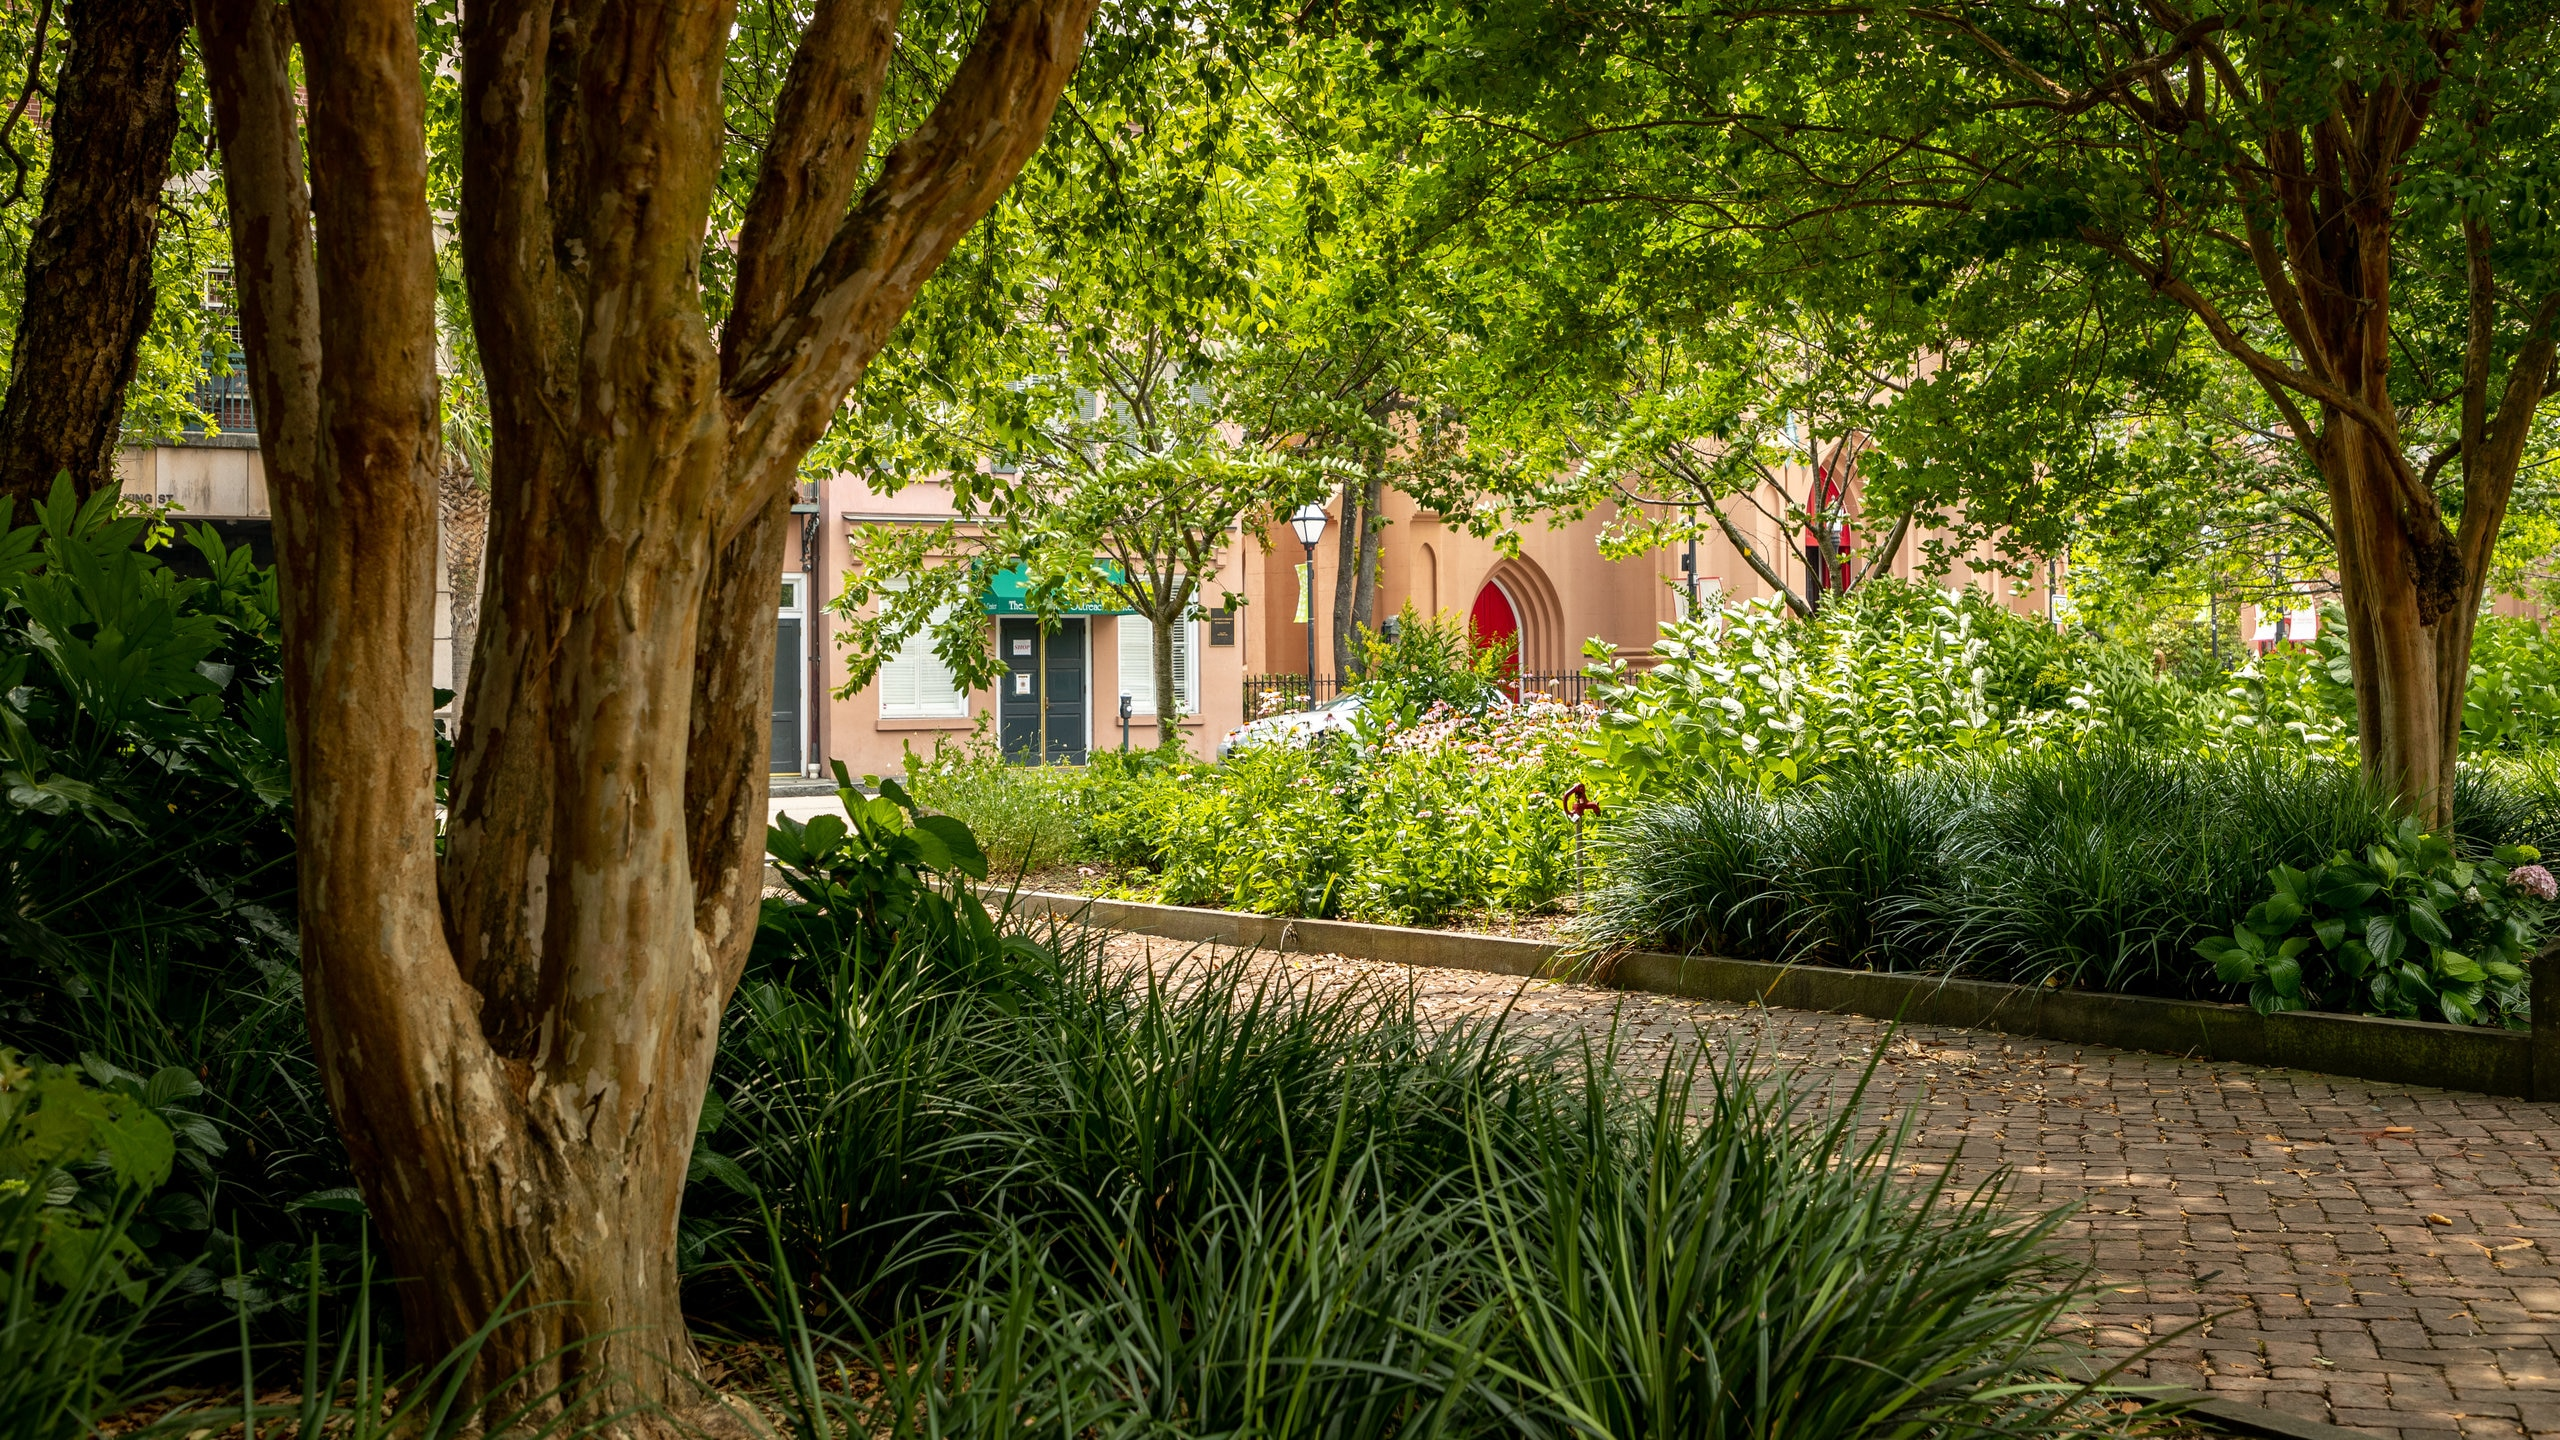 Marion Square, Charleston, South Carolina, United States of America